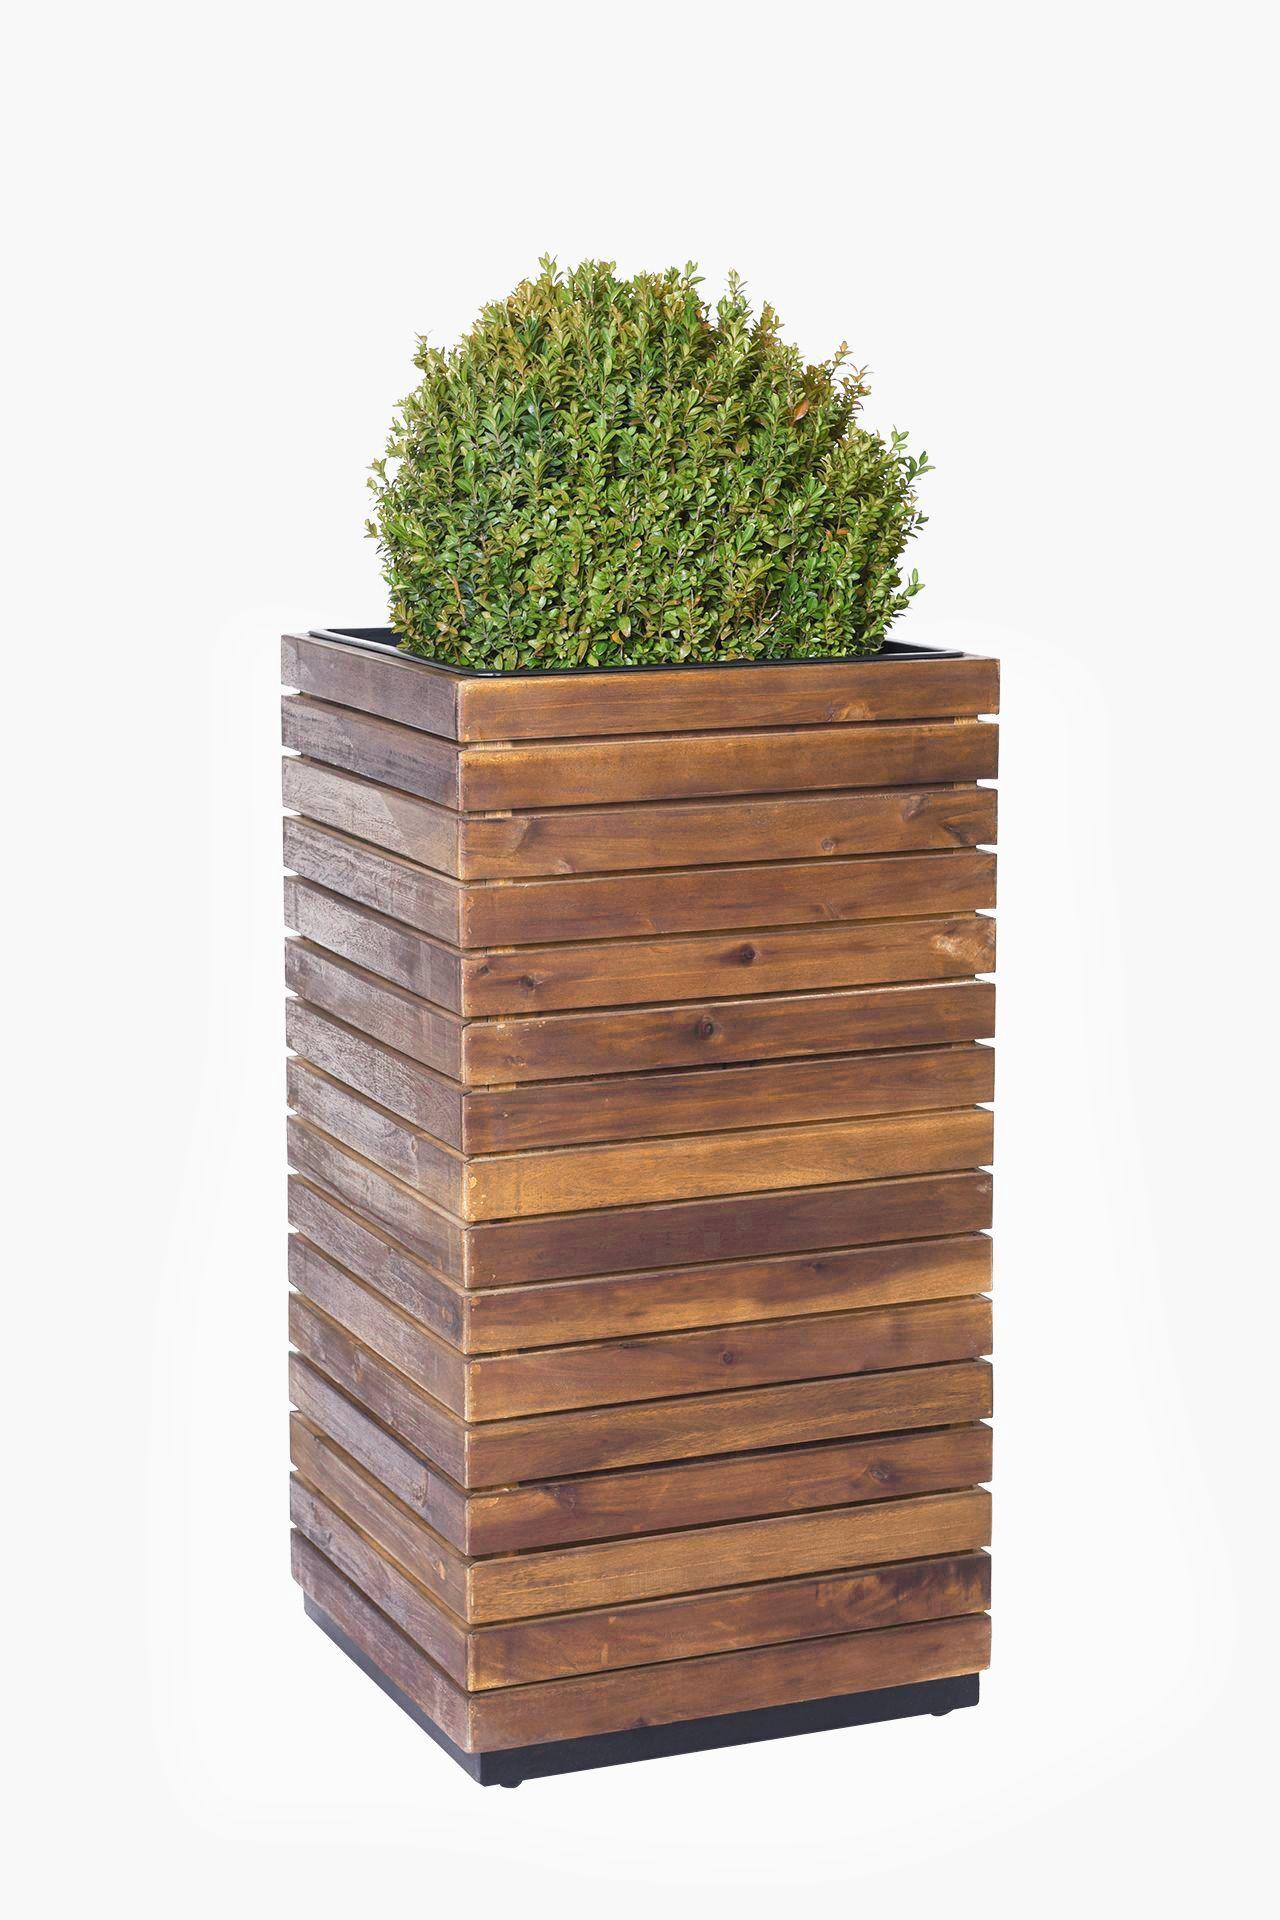 Pflanzkubel Blumenkubel Holz Akazie Block Saule Braun